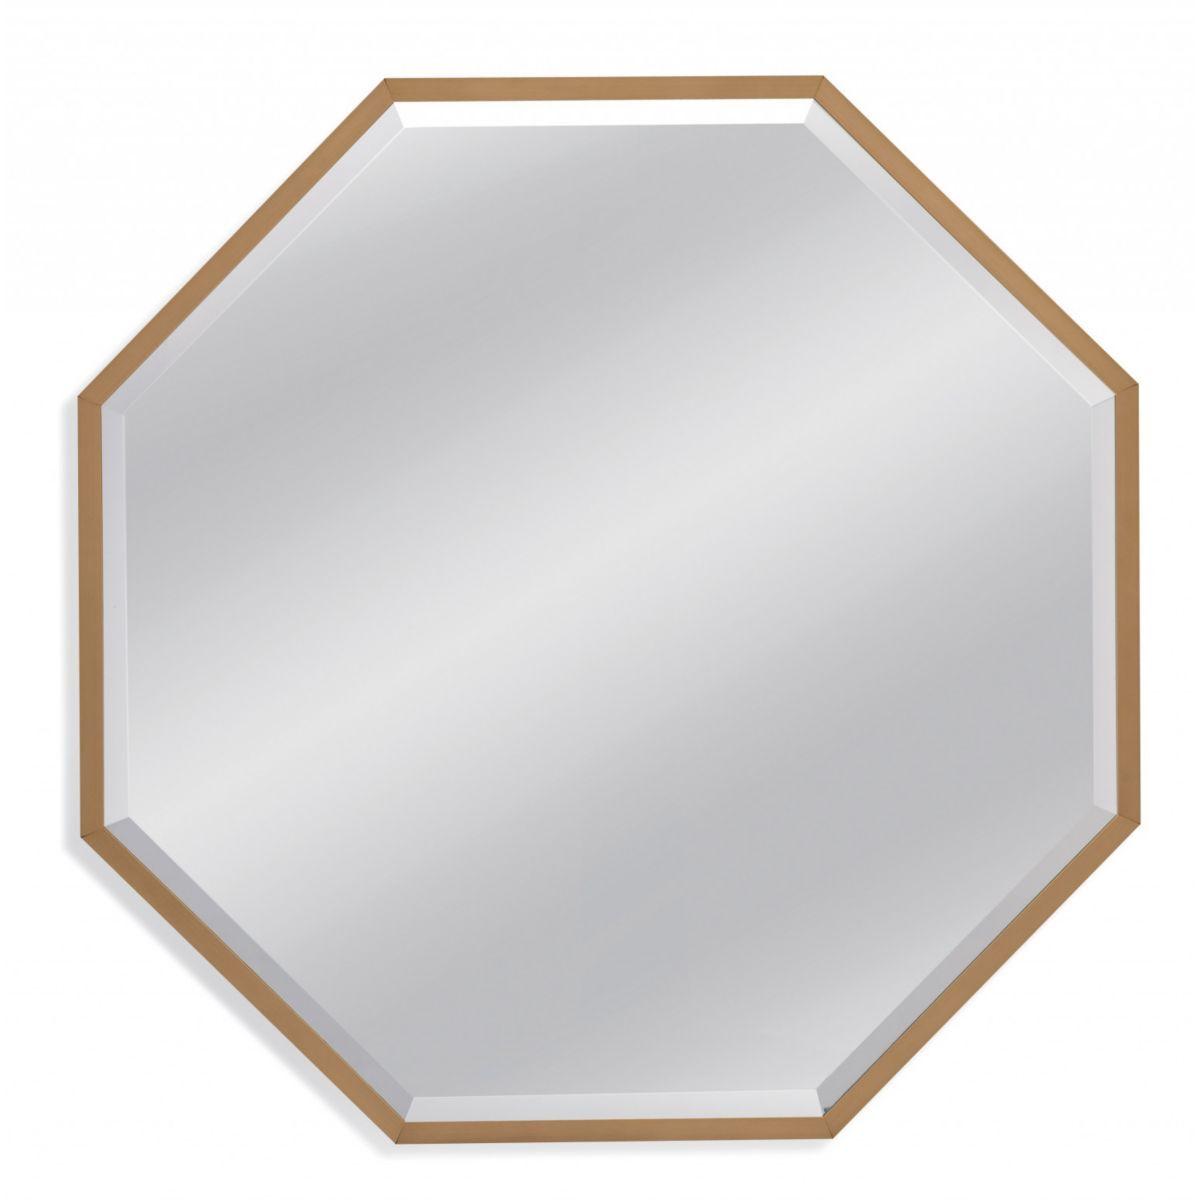 Directbuy Kitchen Cabinets: Catalog - DirectBuy® Bath 2 - 40 X 40 Or 48 X 48